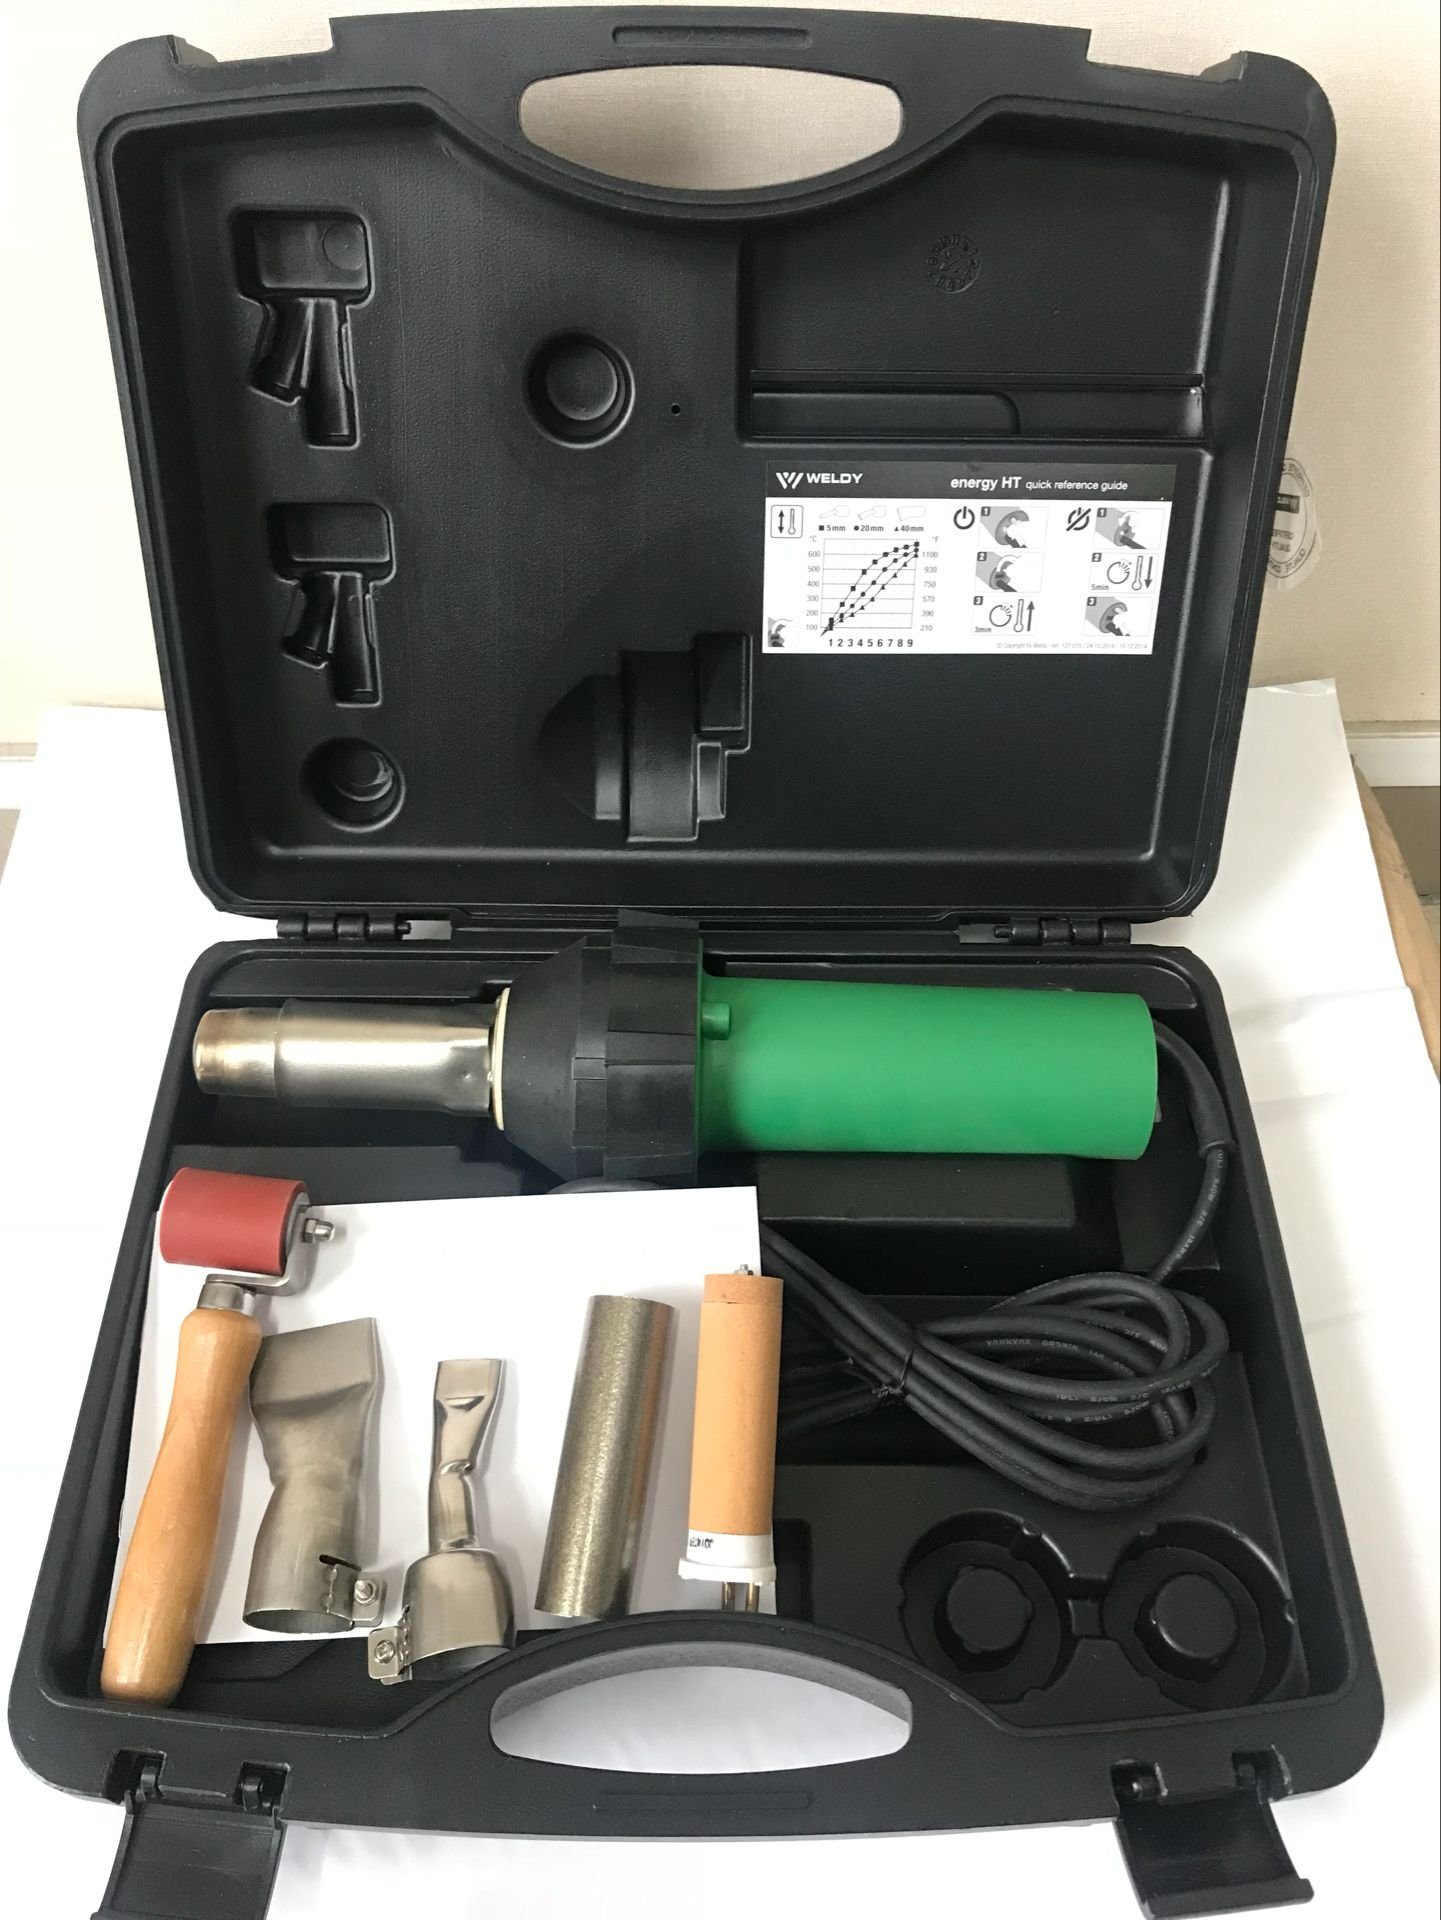 110V/220V 1600W CE Handheld Hot Air Plastic Welder Gun PVC welding Hot Air Welding Torch